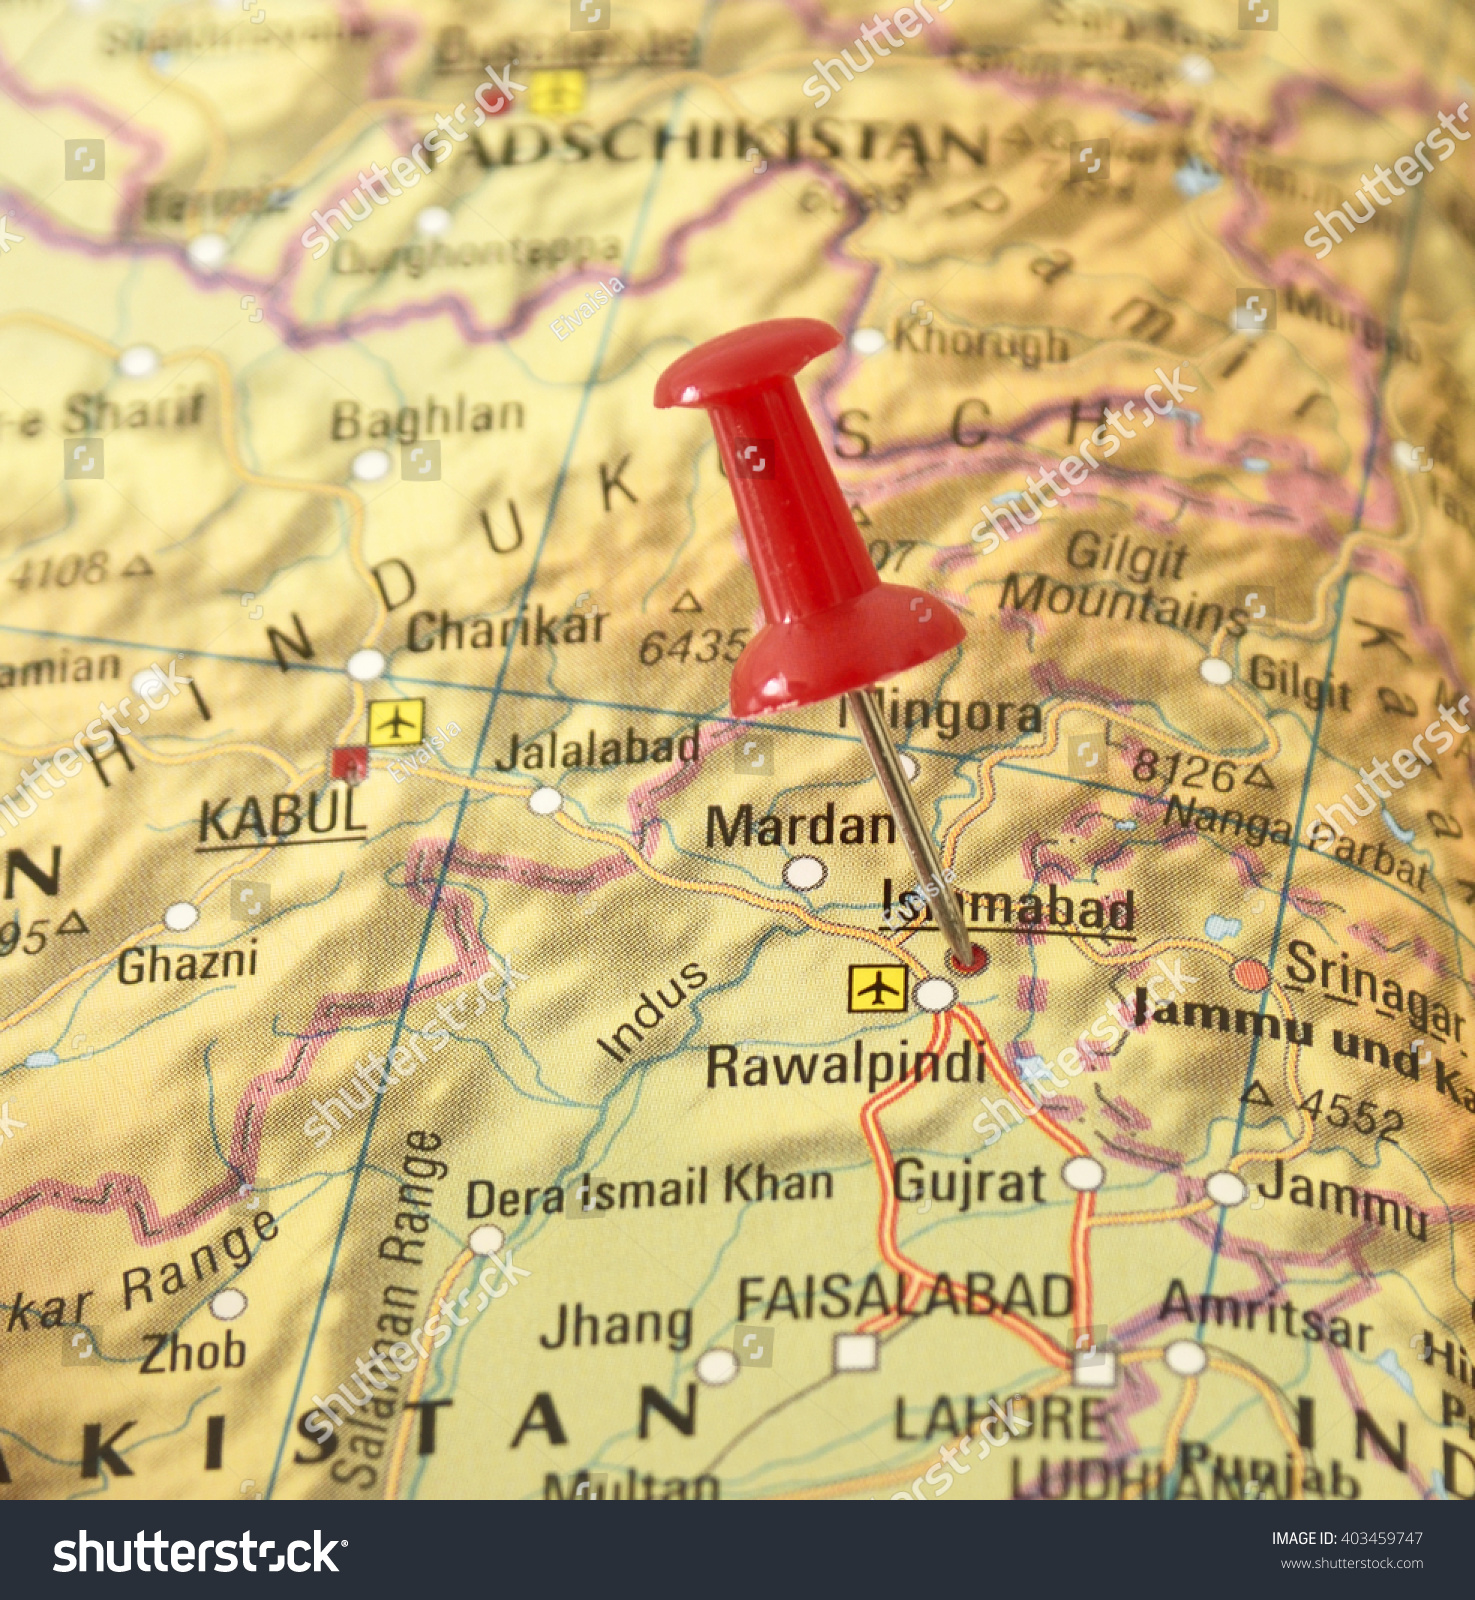 Map Pakistan Pin Set On Islamabad Stock Photo Shutterstock - Charikar map